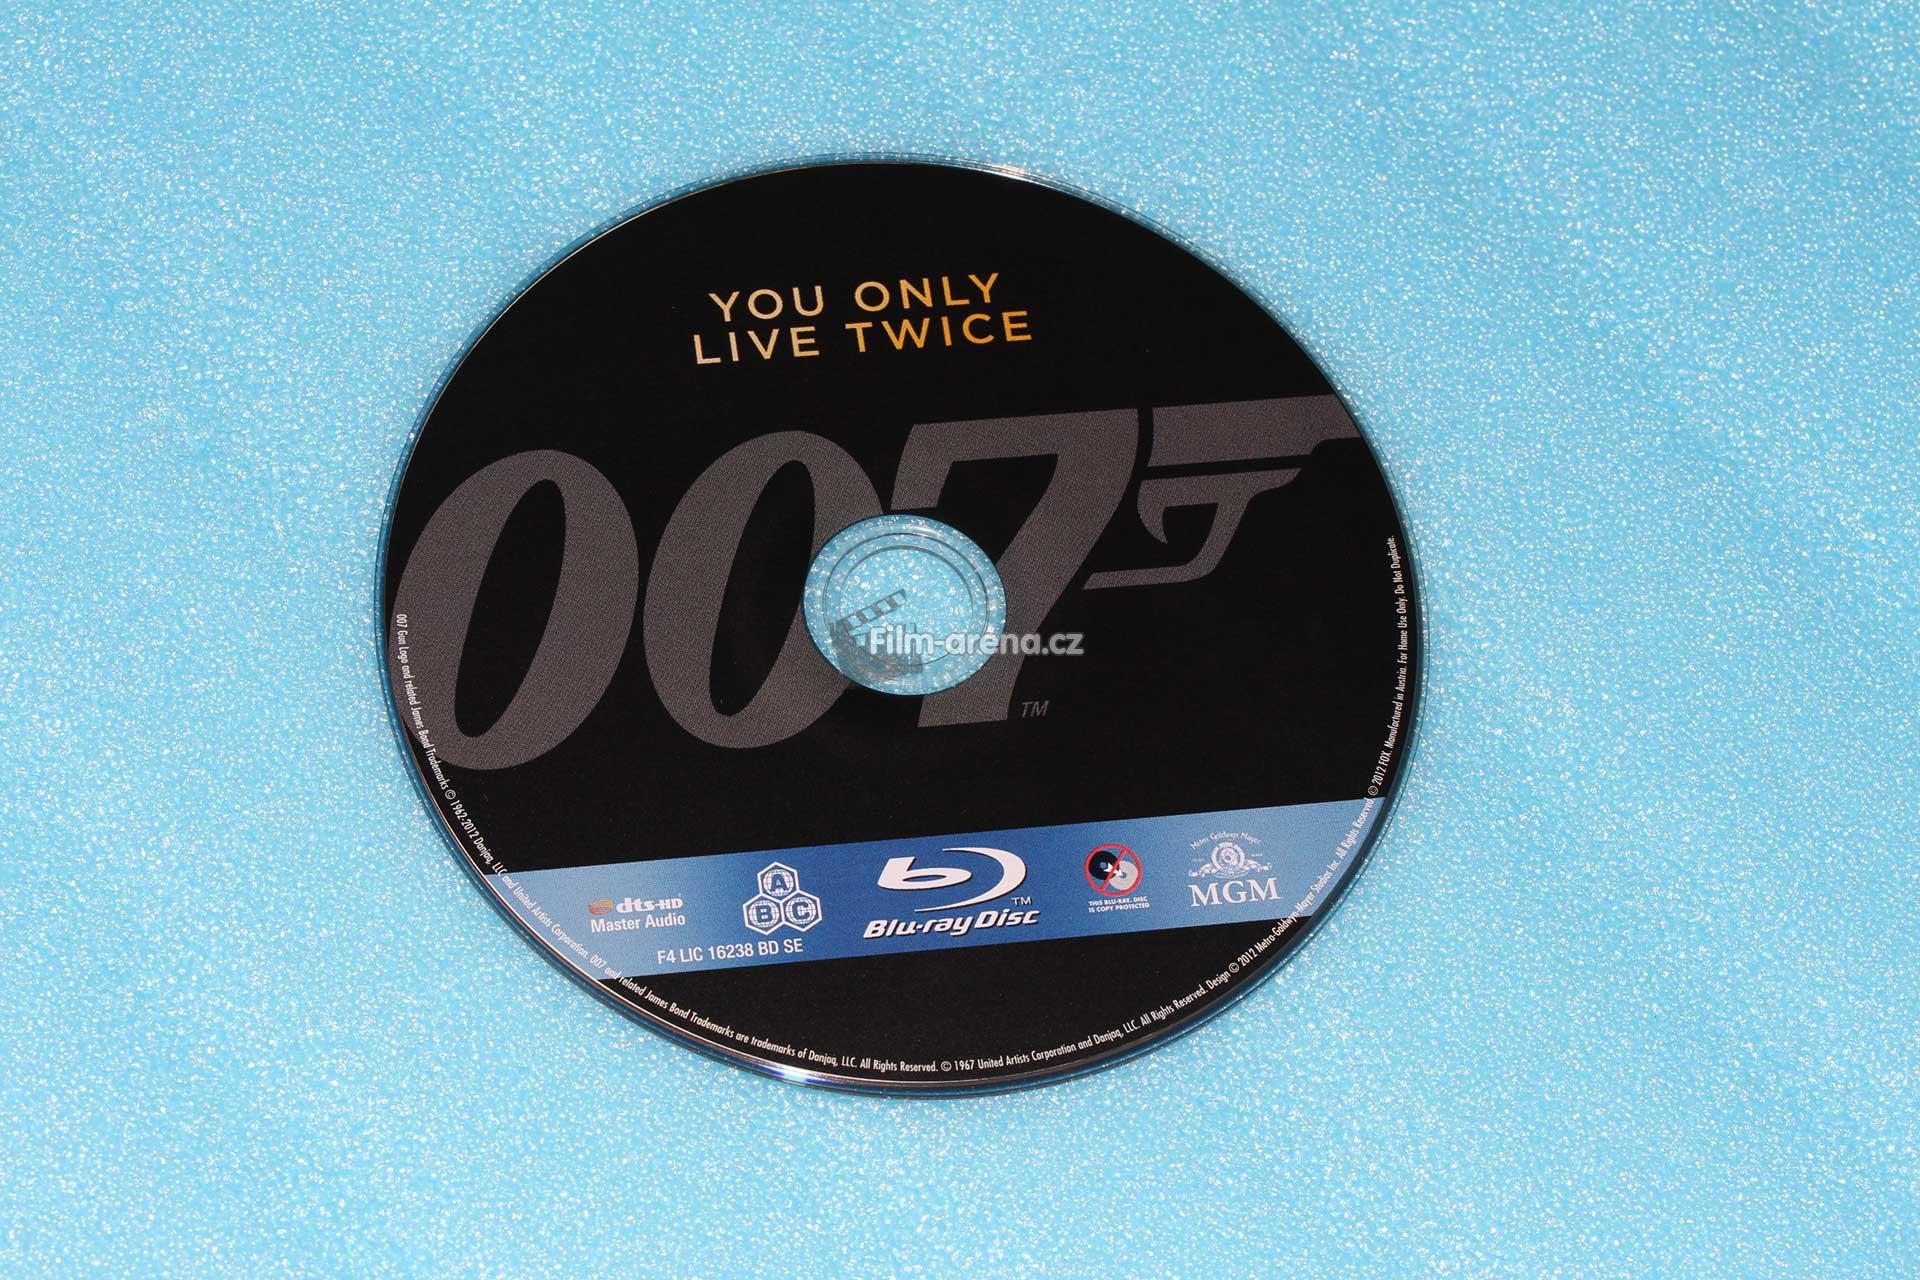 http://www.filmarena.cz/upload/images/nazivo/James_Bond/1967_Zijes_jenom_dvakrat/1967_zijes_06.jpg